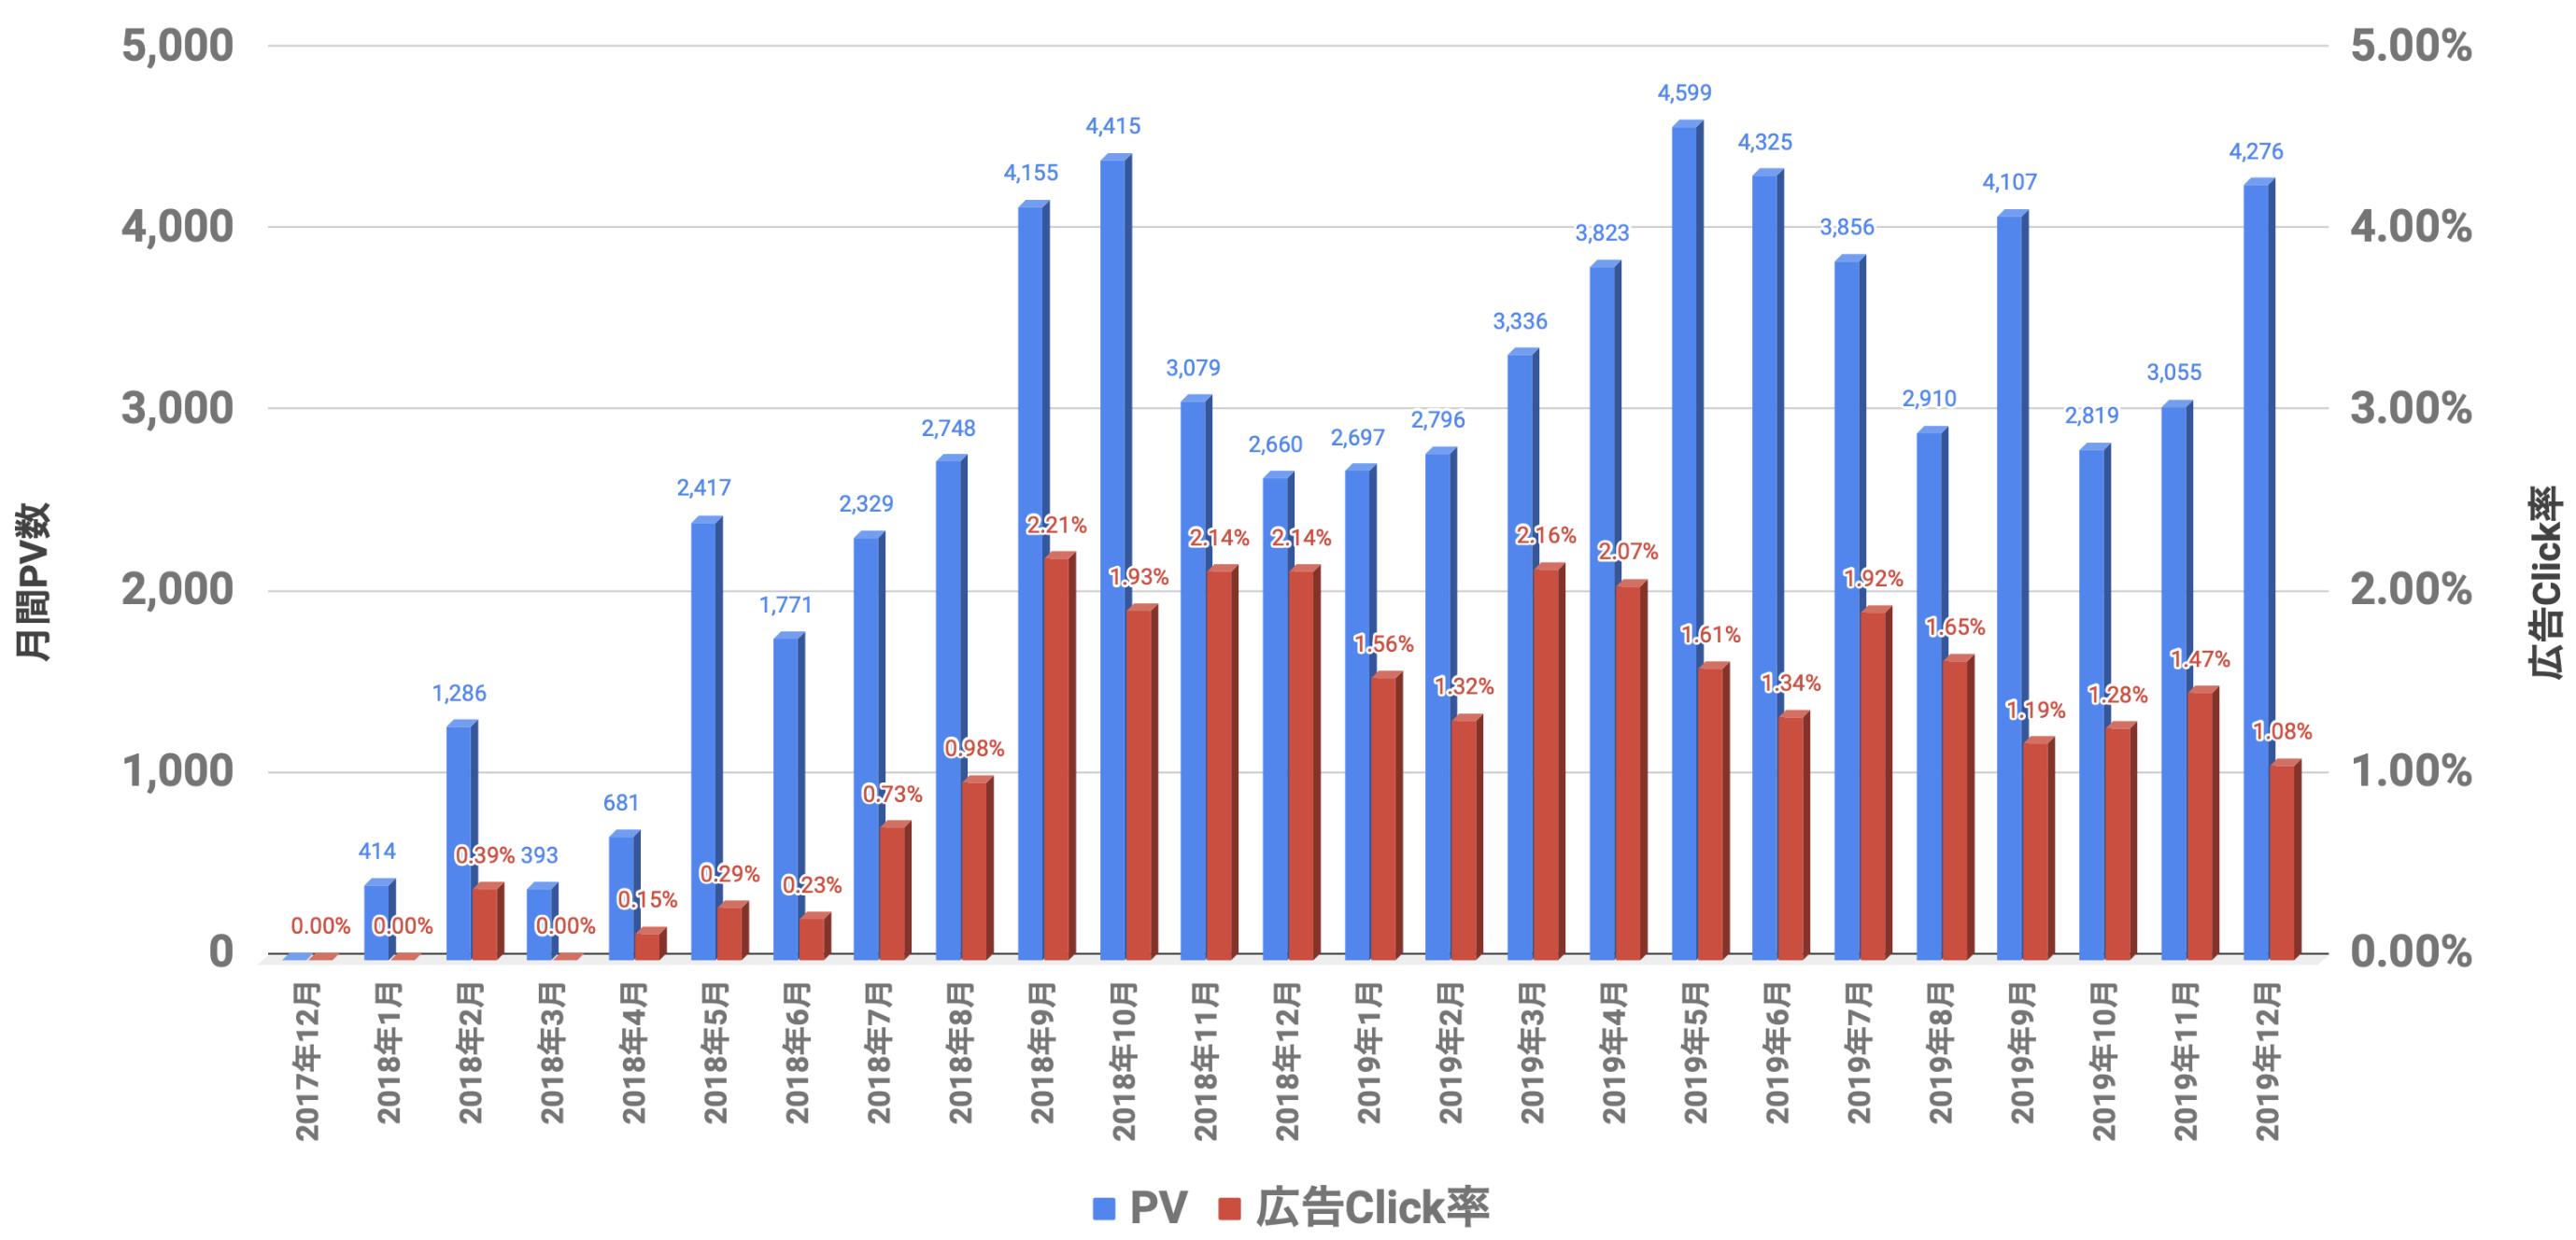 PVと広告Click率 2019年12月